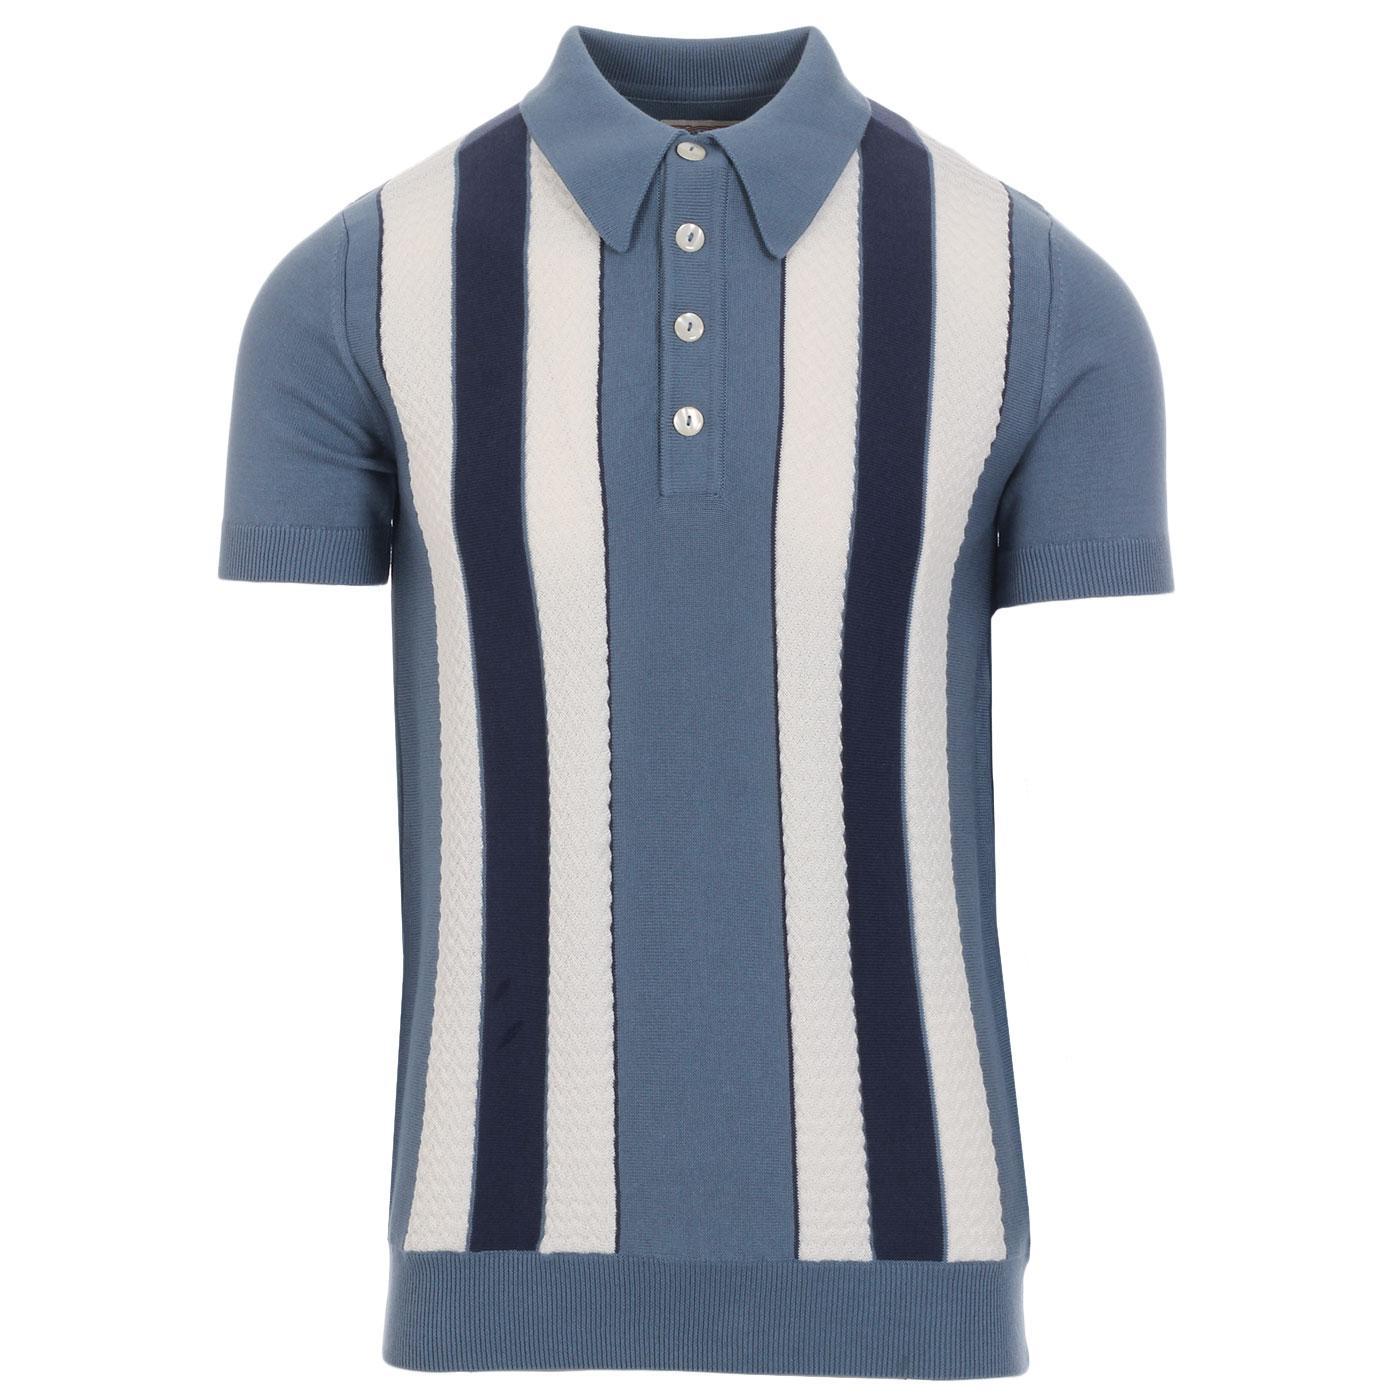 SKA & SOUL Mod Textured Stripe Knit Polo Top DEMIM